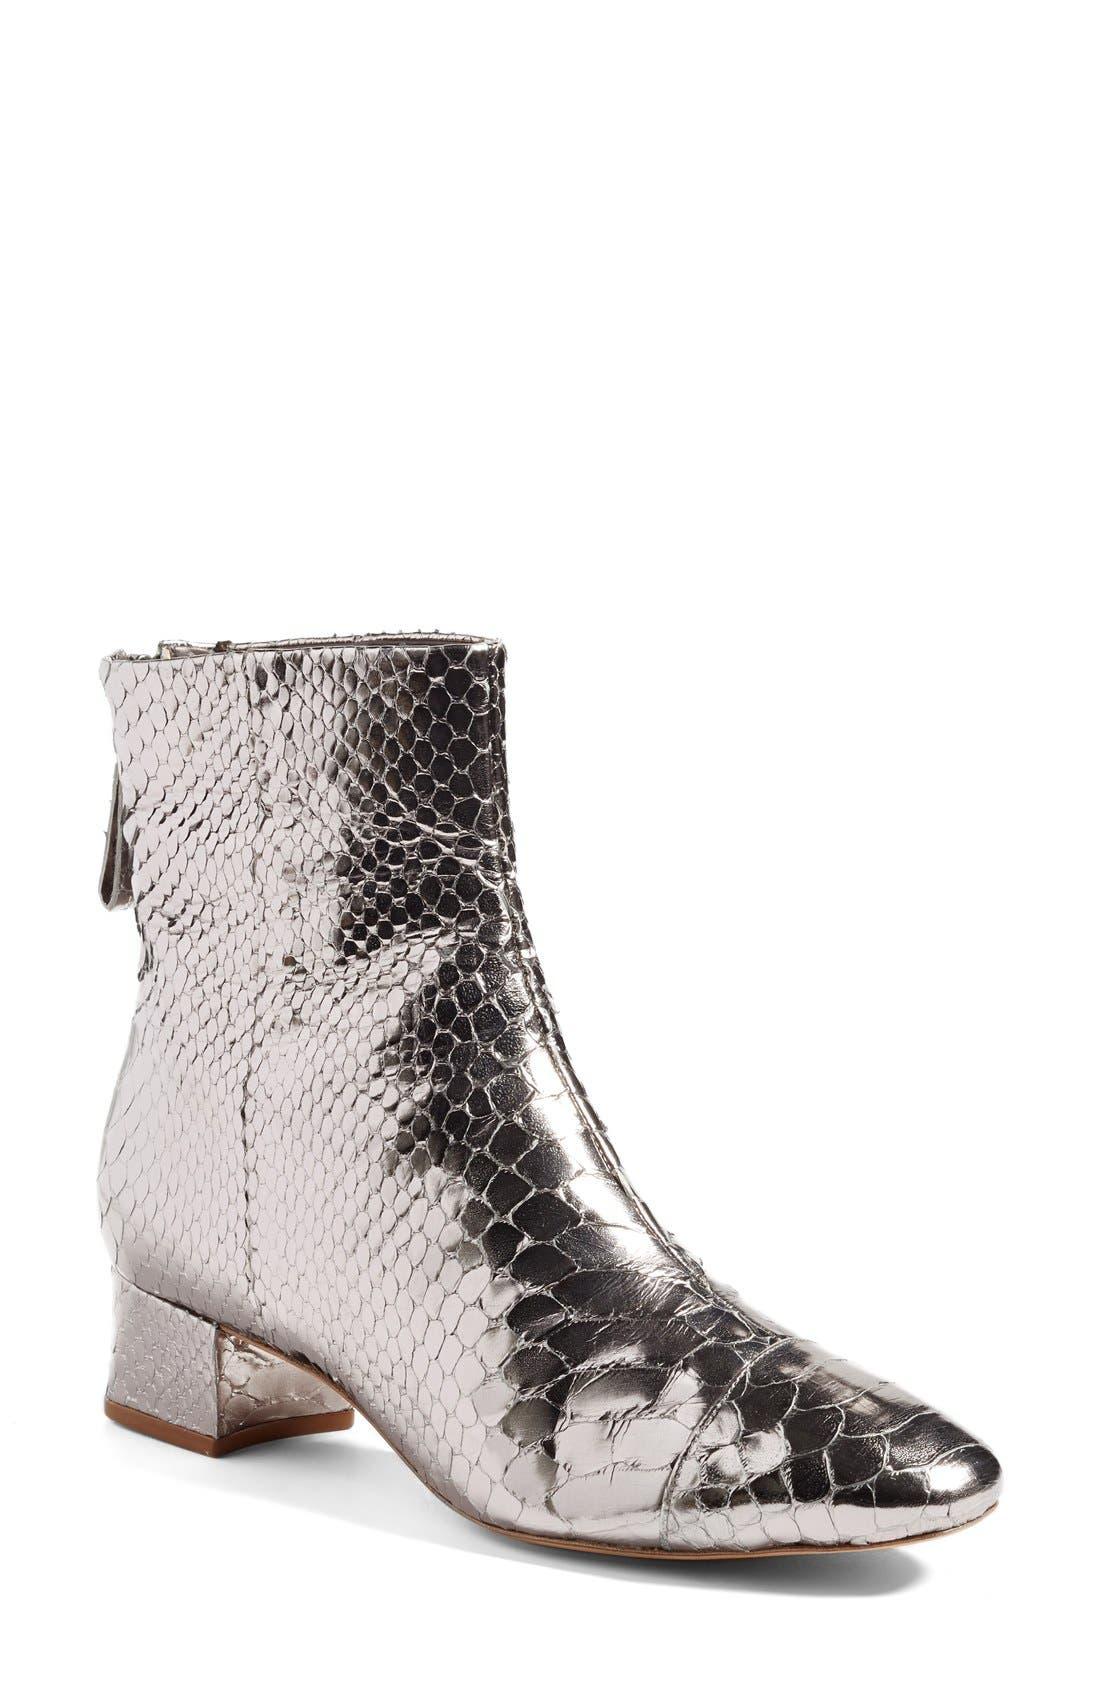 Alternate Image 1 Selected - Alexandre Birman 'Jessie' Metallic Genuine Python Bootie (Women)